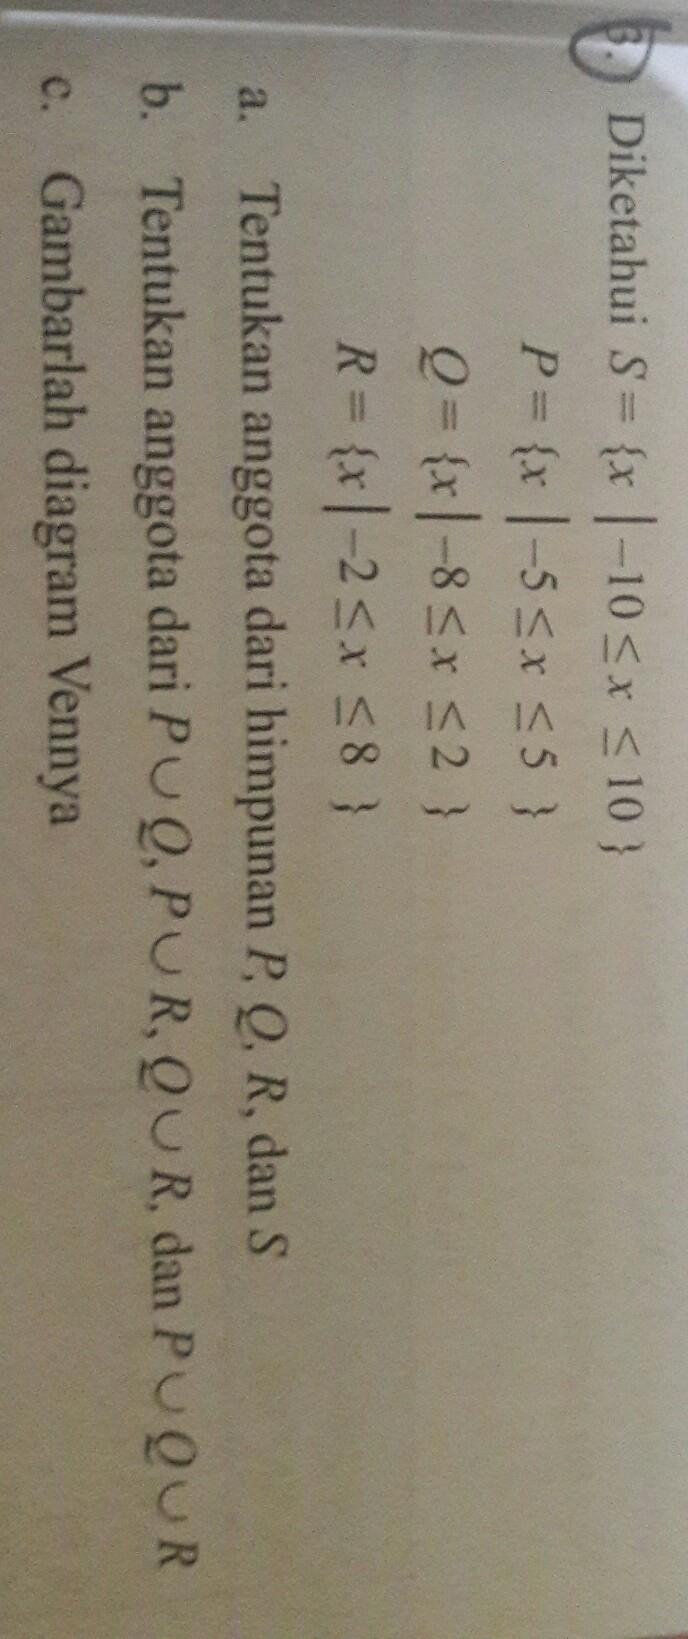 Sebutkan Anggota-anggota Himpunan P Dan Q : sebutkan, anggota-anggota, himpunan, A.tentukan, Anggota, Himpunan, P,q,r, Tentukan, Irisan, Brainly.co.id